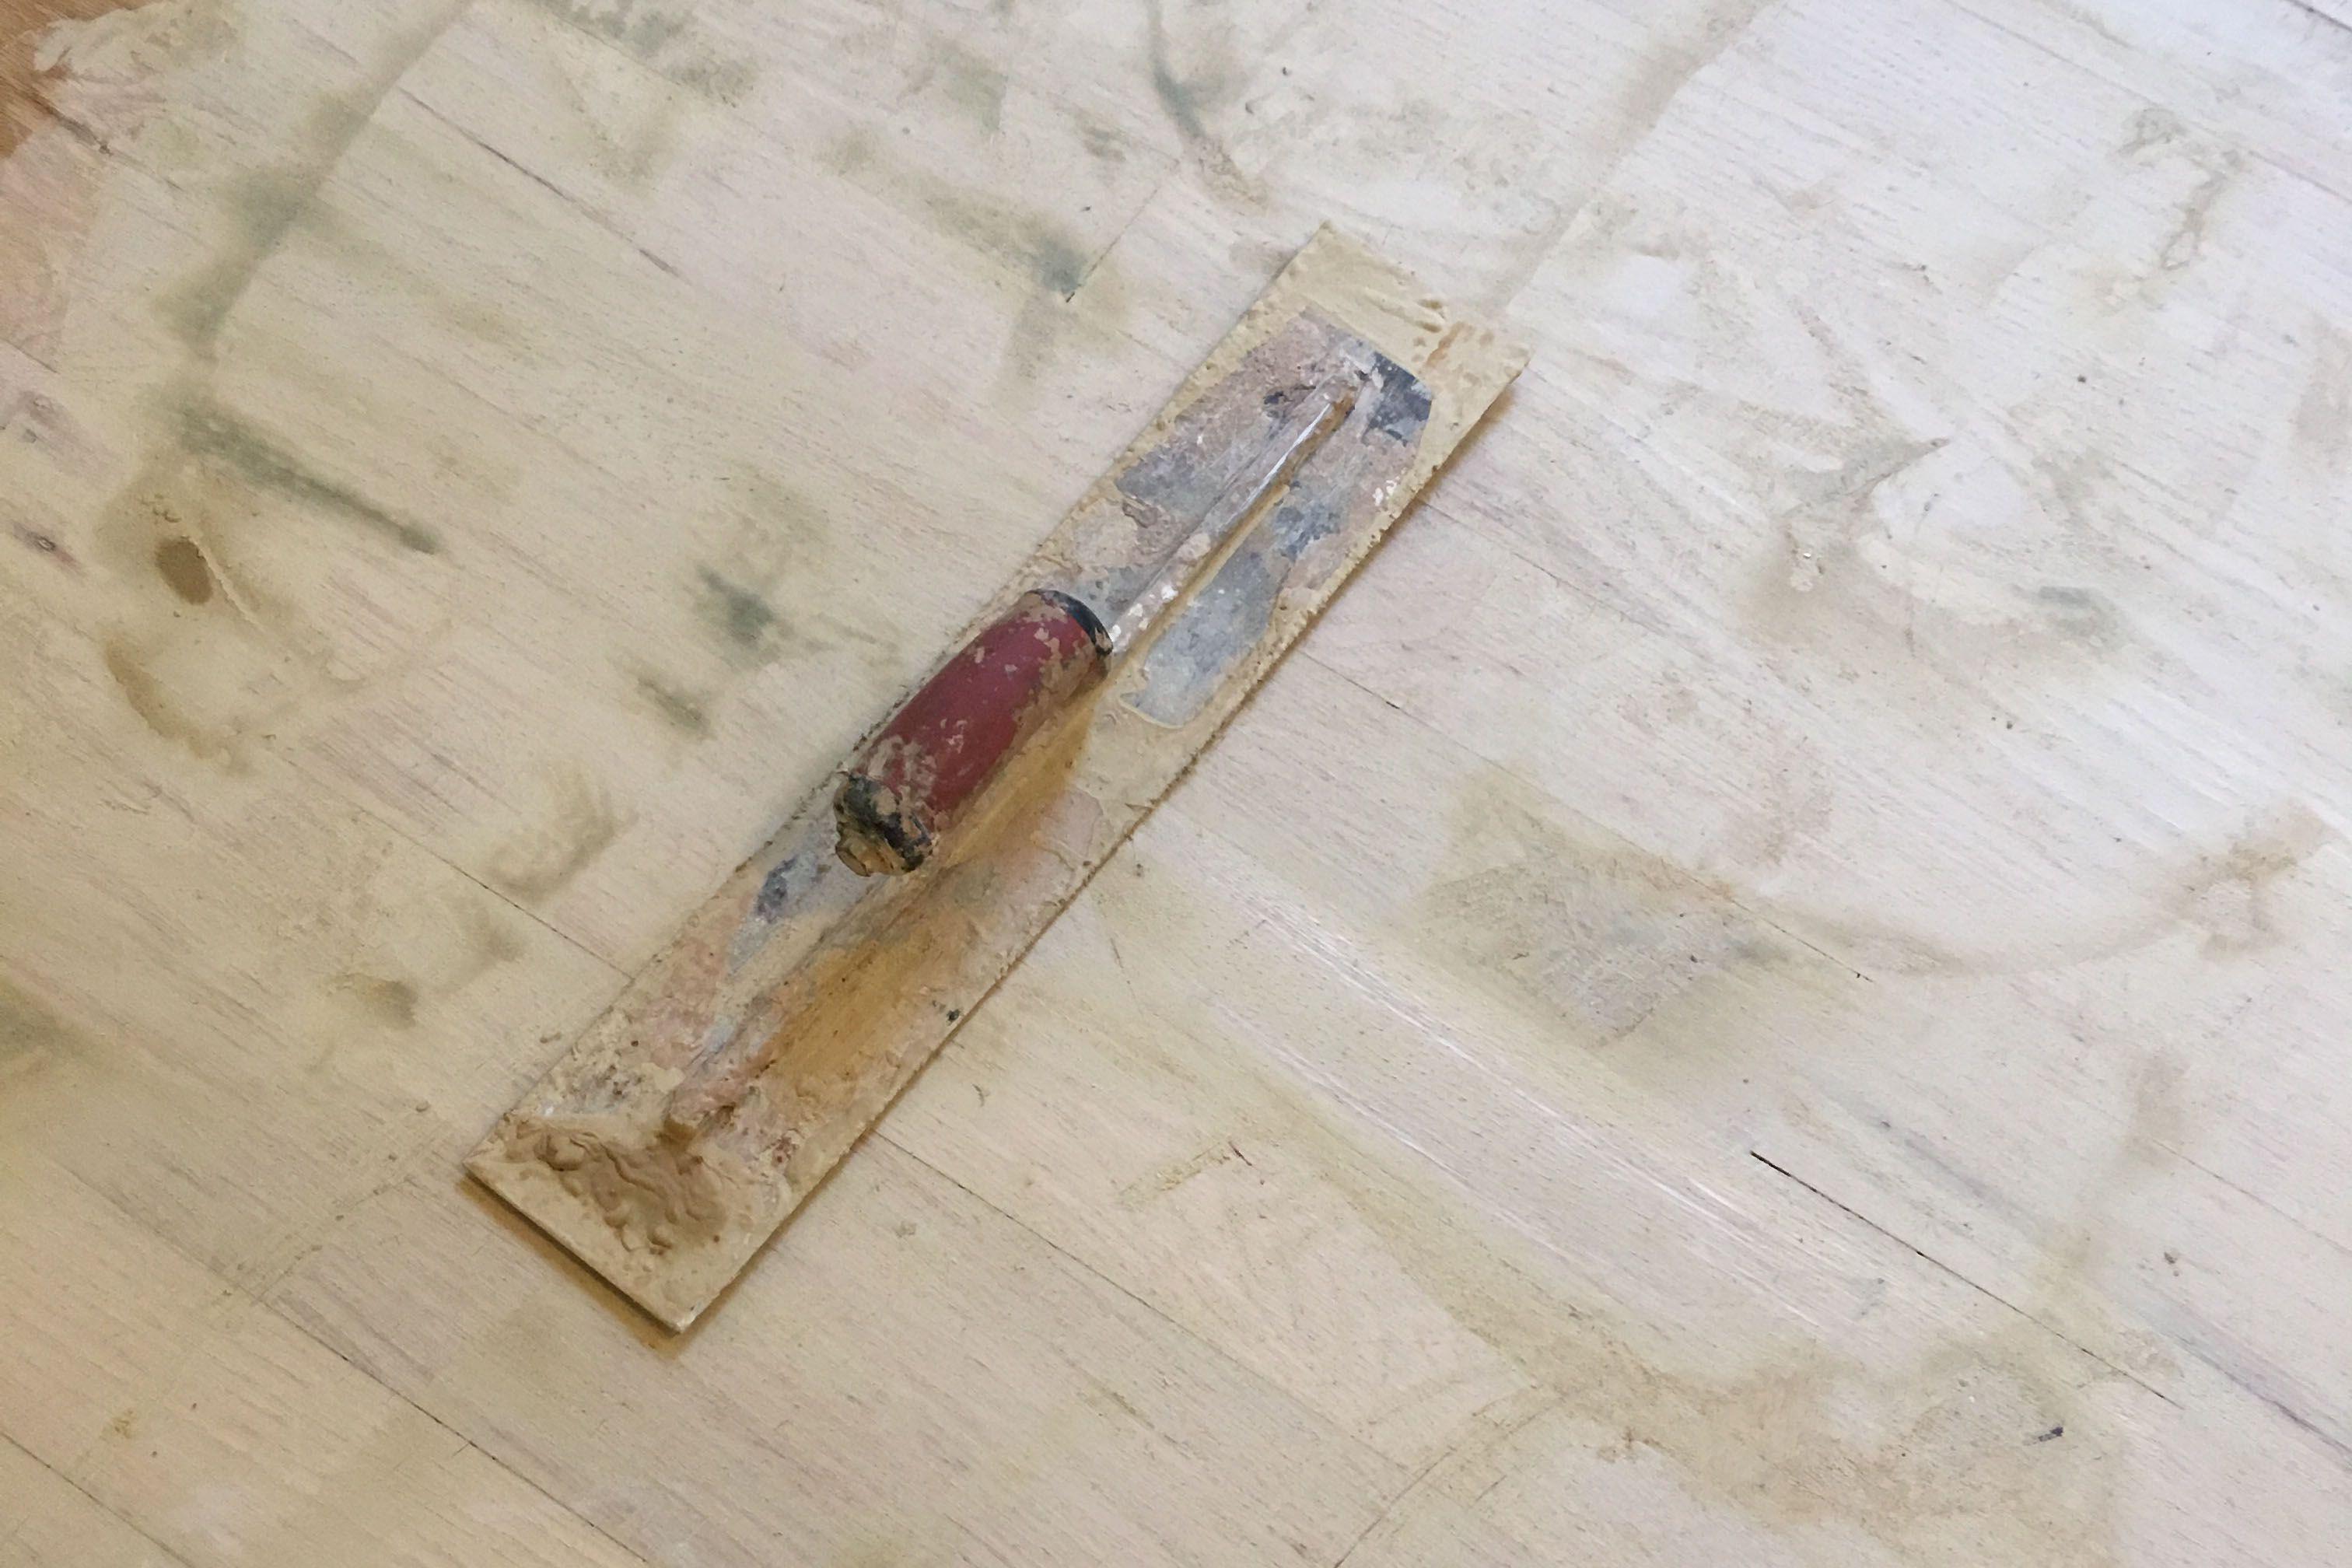 average price to refinish hardwood floors of 7 things to know before you refinish hardwood floors with regard to trough hardwood floor manhattan avenue via smallspaces about com 579138783df78c173490f8a5